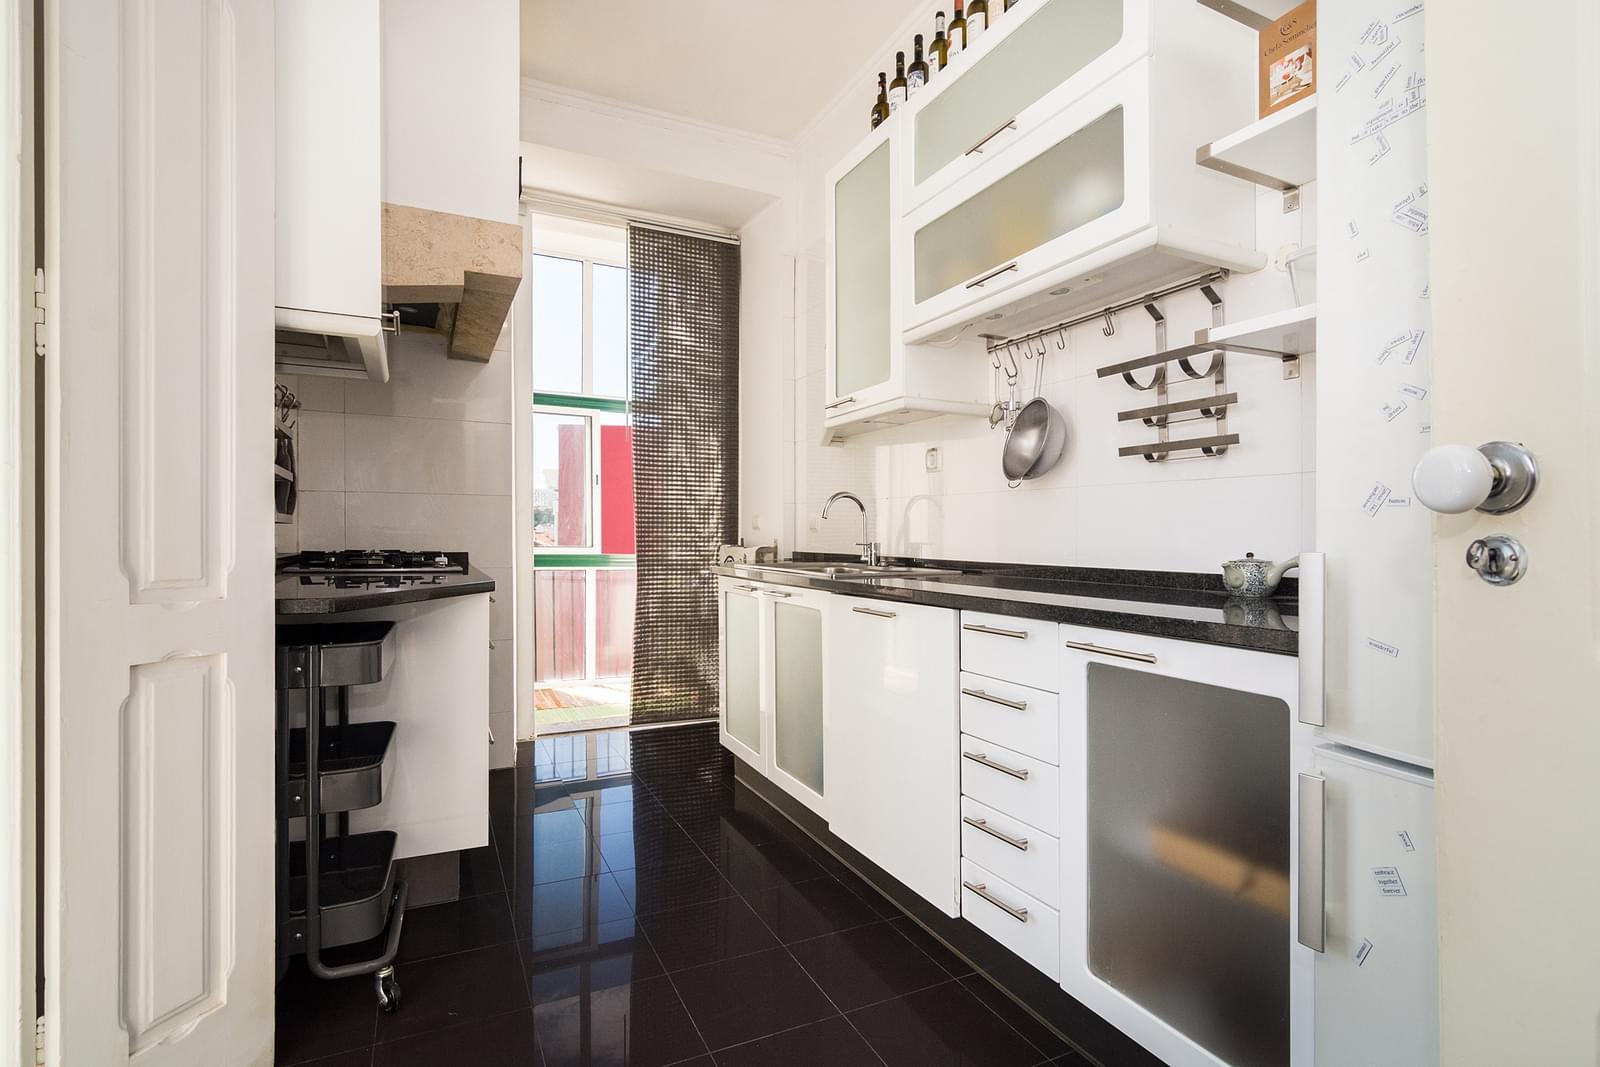 pf17569-apartamento-t2-lisboa-562e5a4e-276d-41a8-b2cc-b5d7a1b9c032